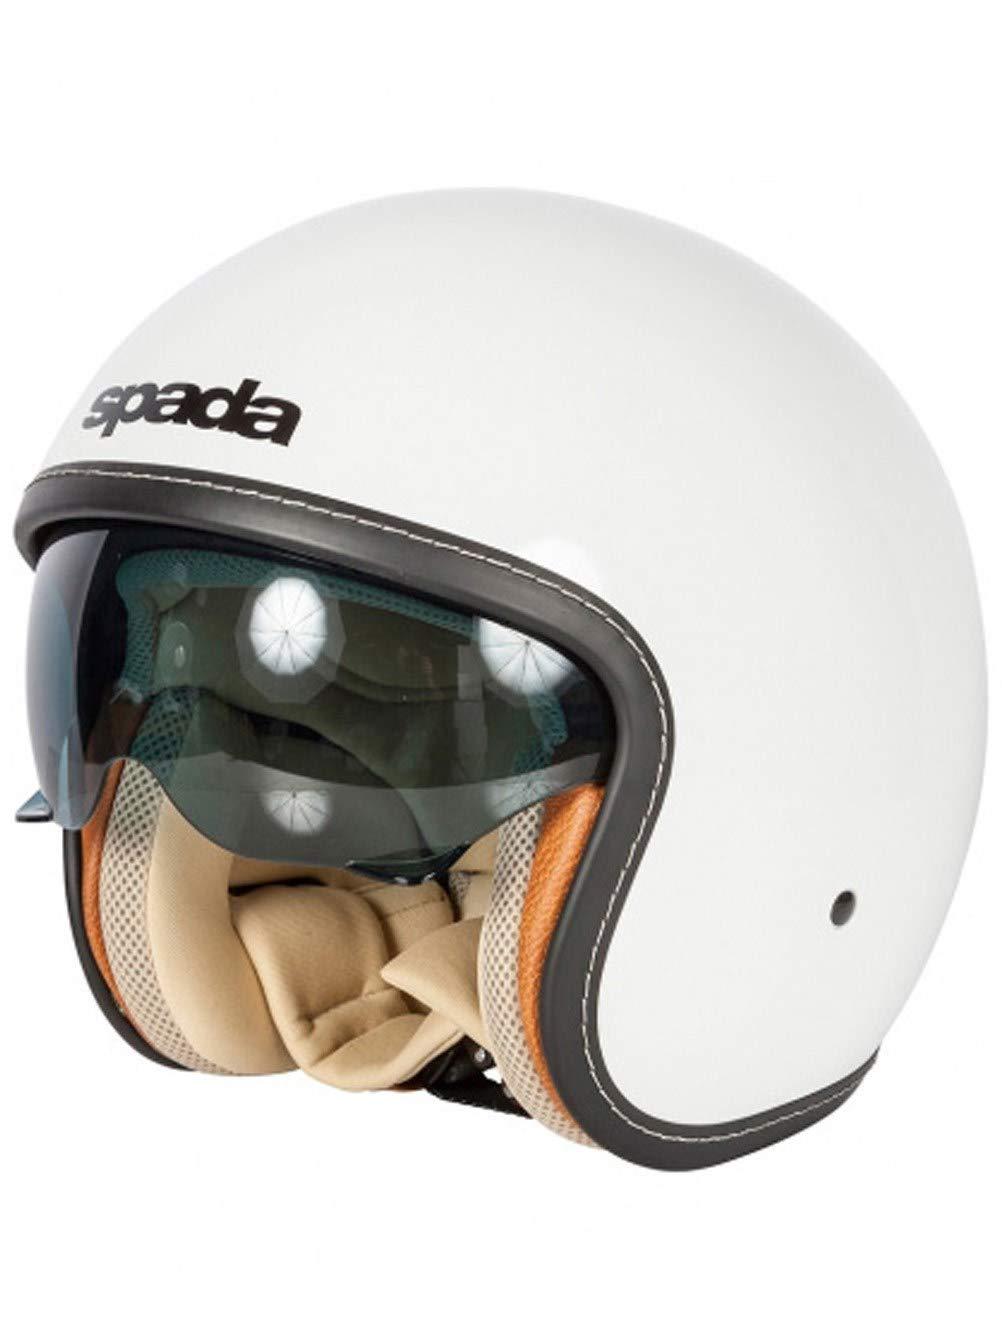 MOTORBIKE OPEN FACE HELMETS SPADA RP388 ADULT MOTORCYCLE SCOOTER JET TOURING HELMET BLACK 1739925